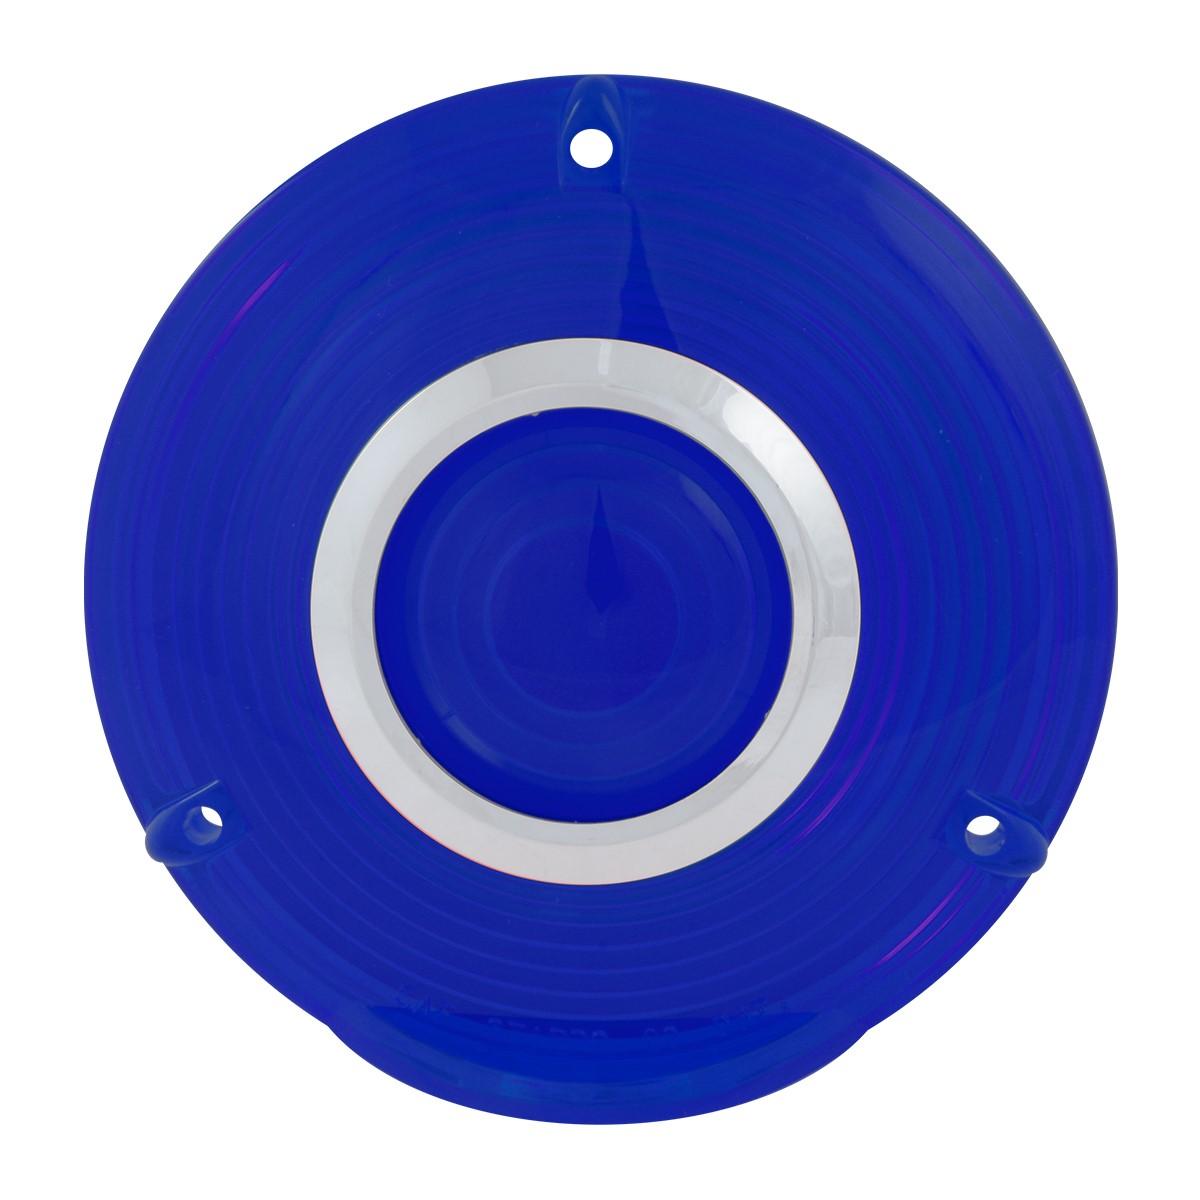 Grand General 86721 Blue Plastic Lens w/ Chrome Rim